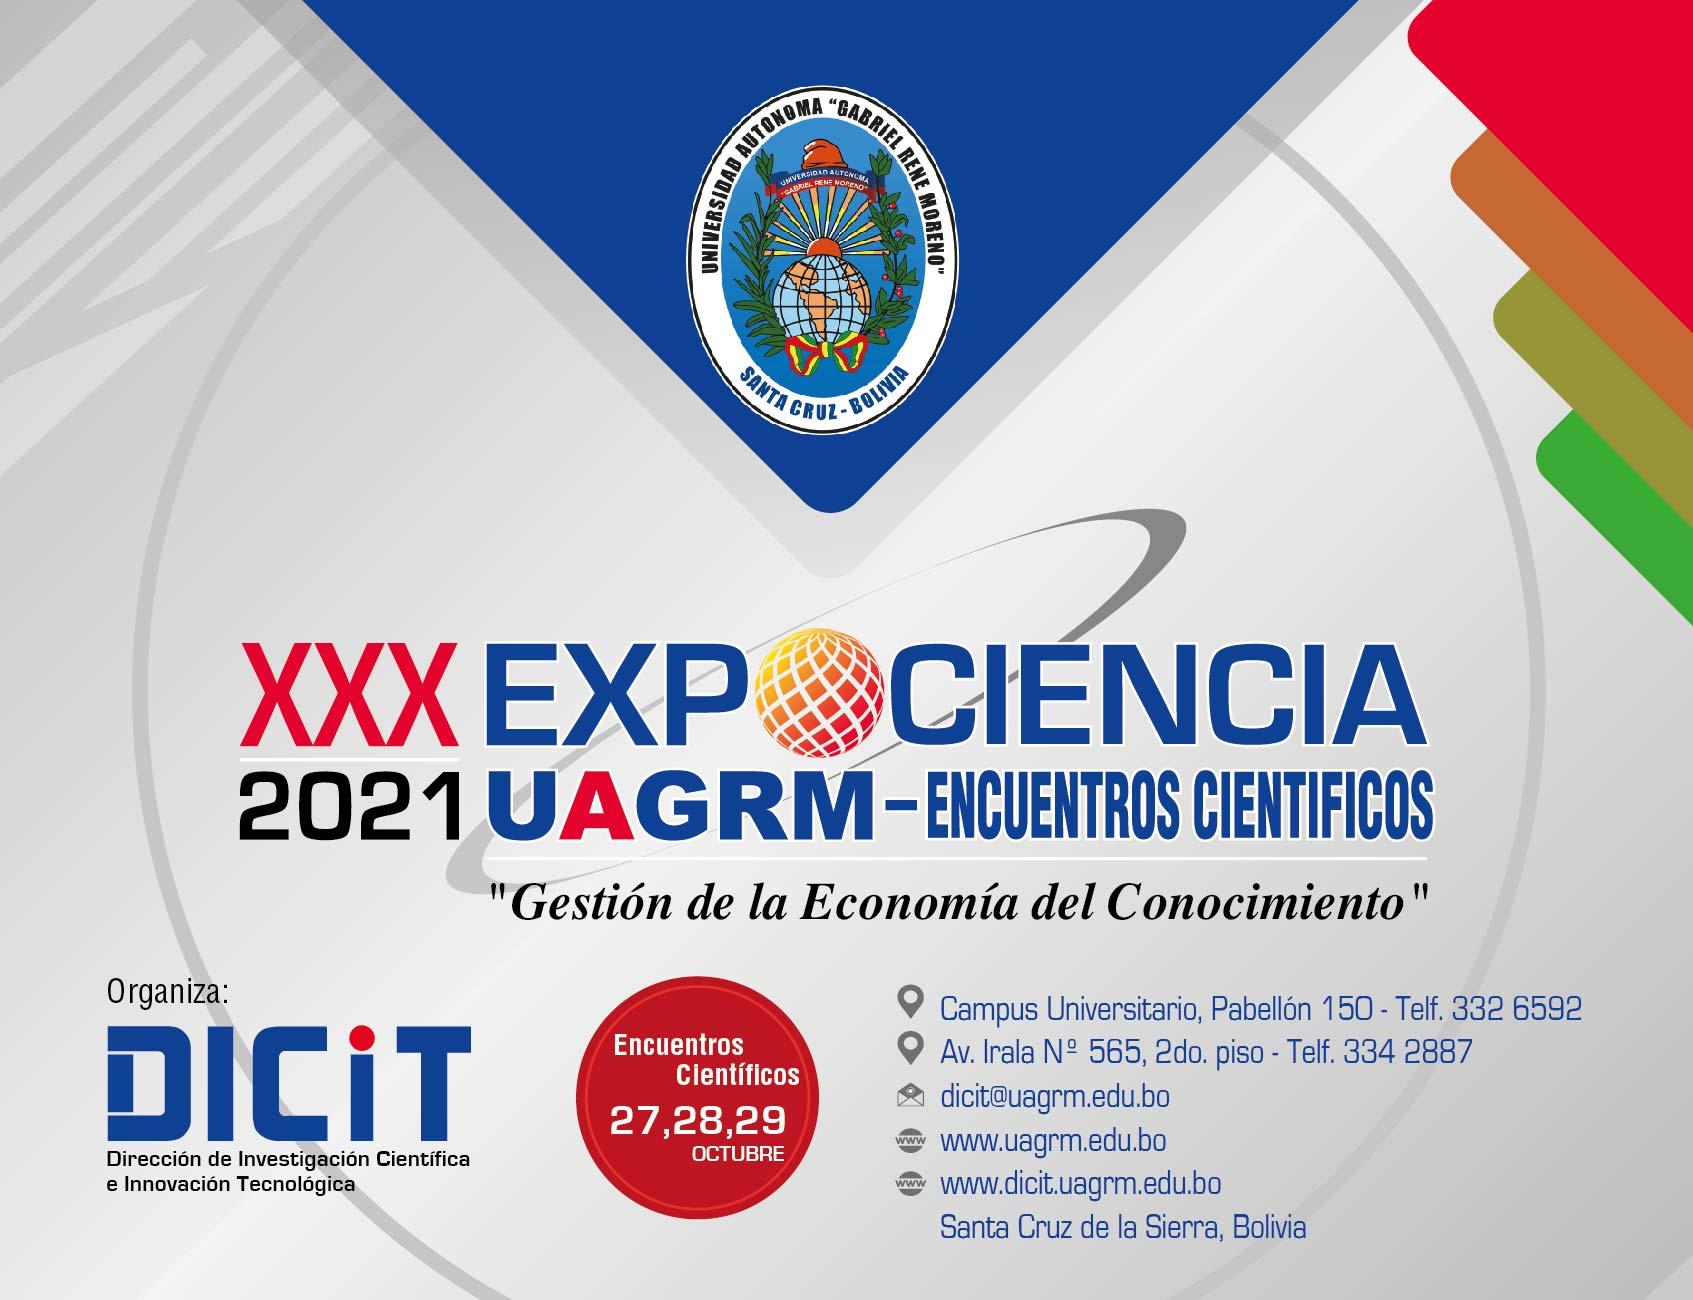 XXX Expociencia UAGRM 2021